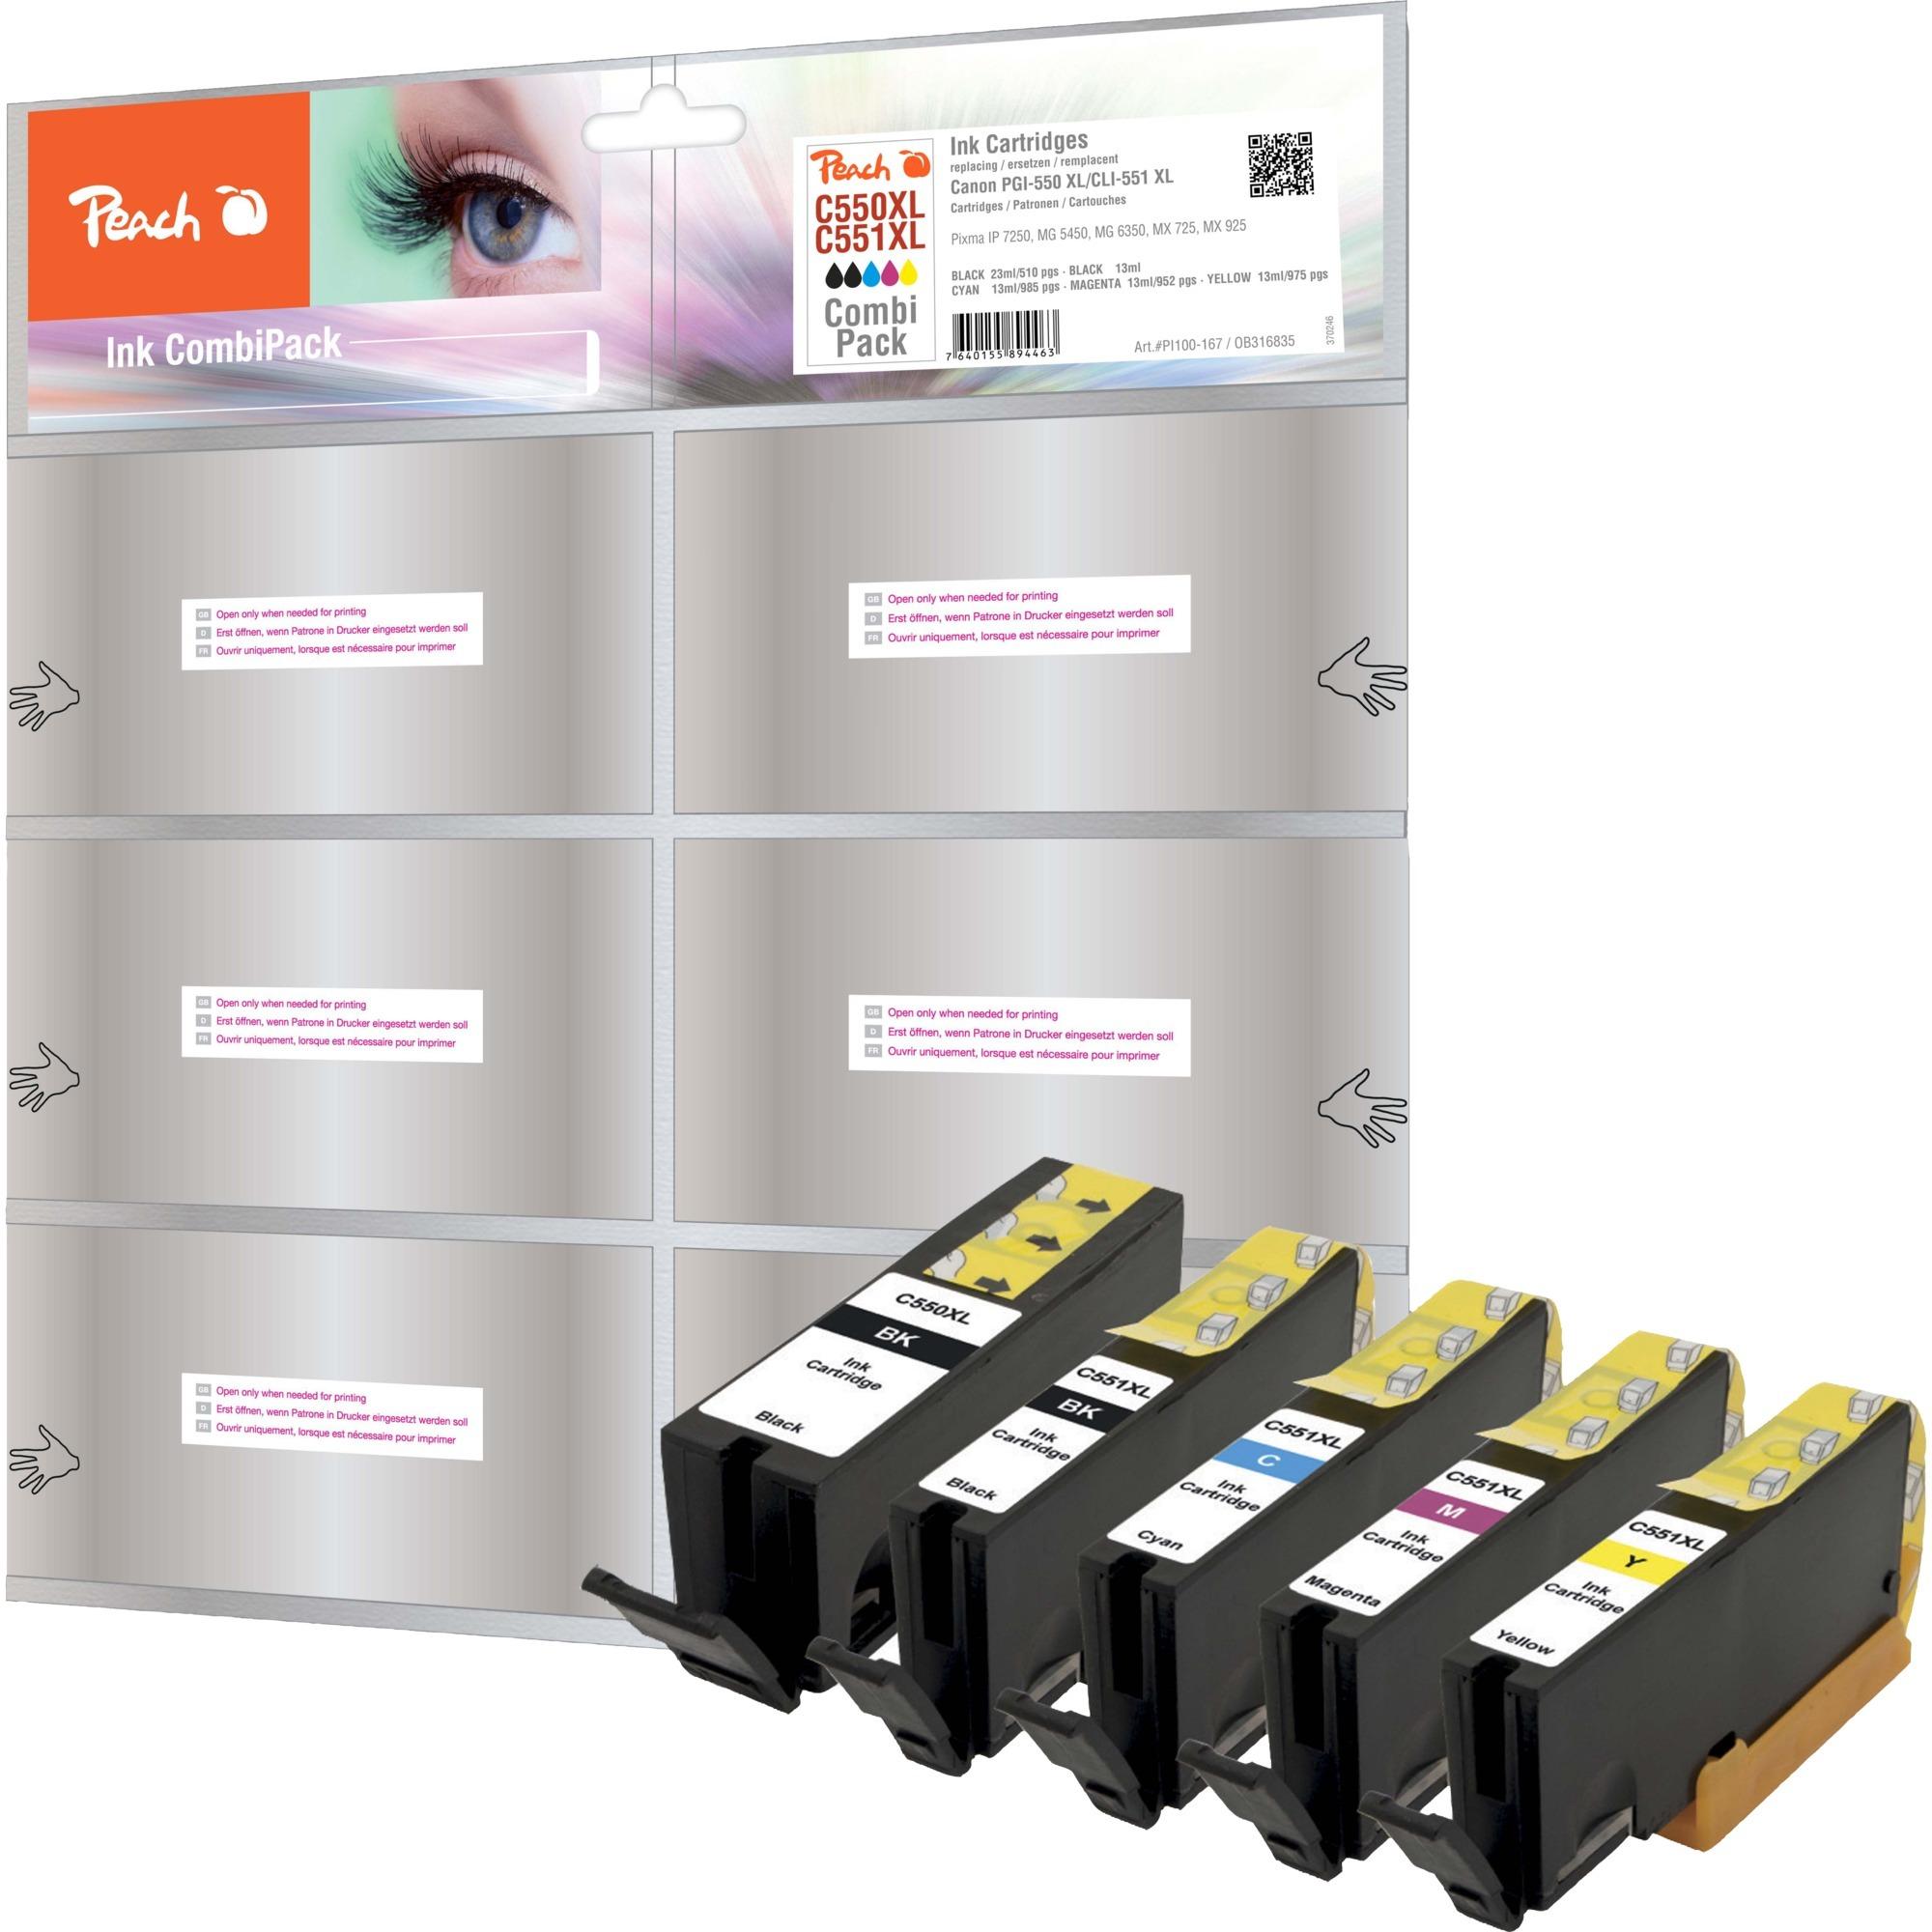 LinkStation 220 Serveur de stockage Ethernet/LAN Noir, Encre